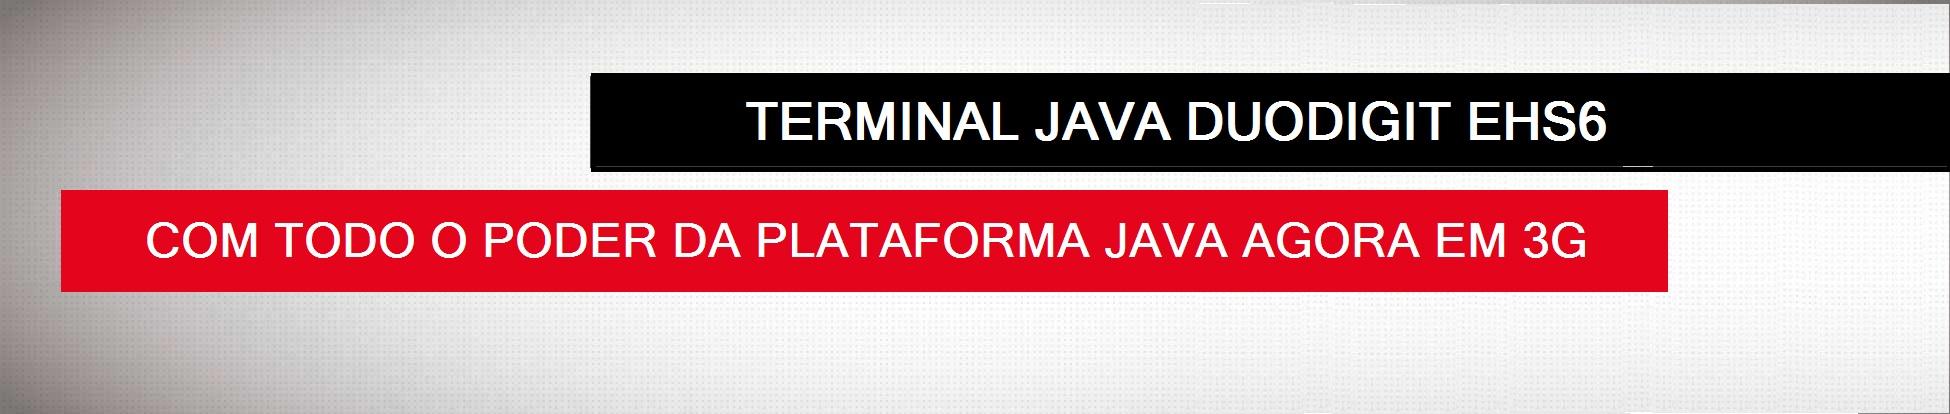 Destaque Terminal Duodigit Java EHS6